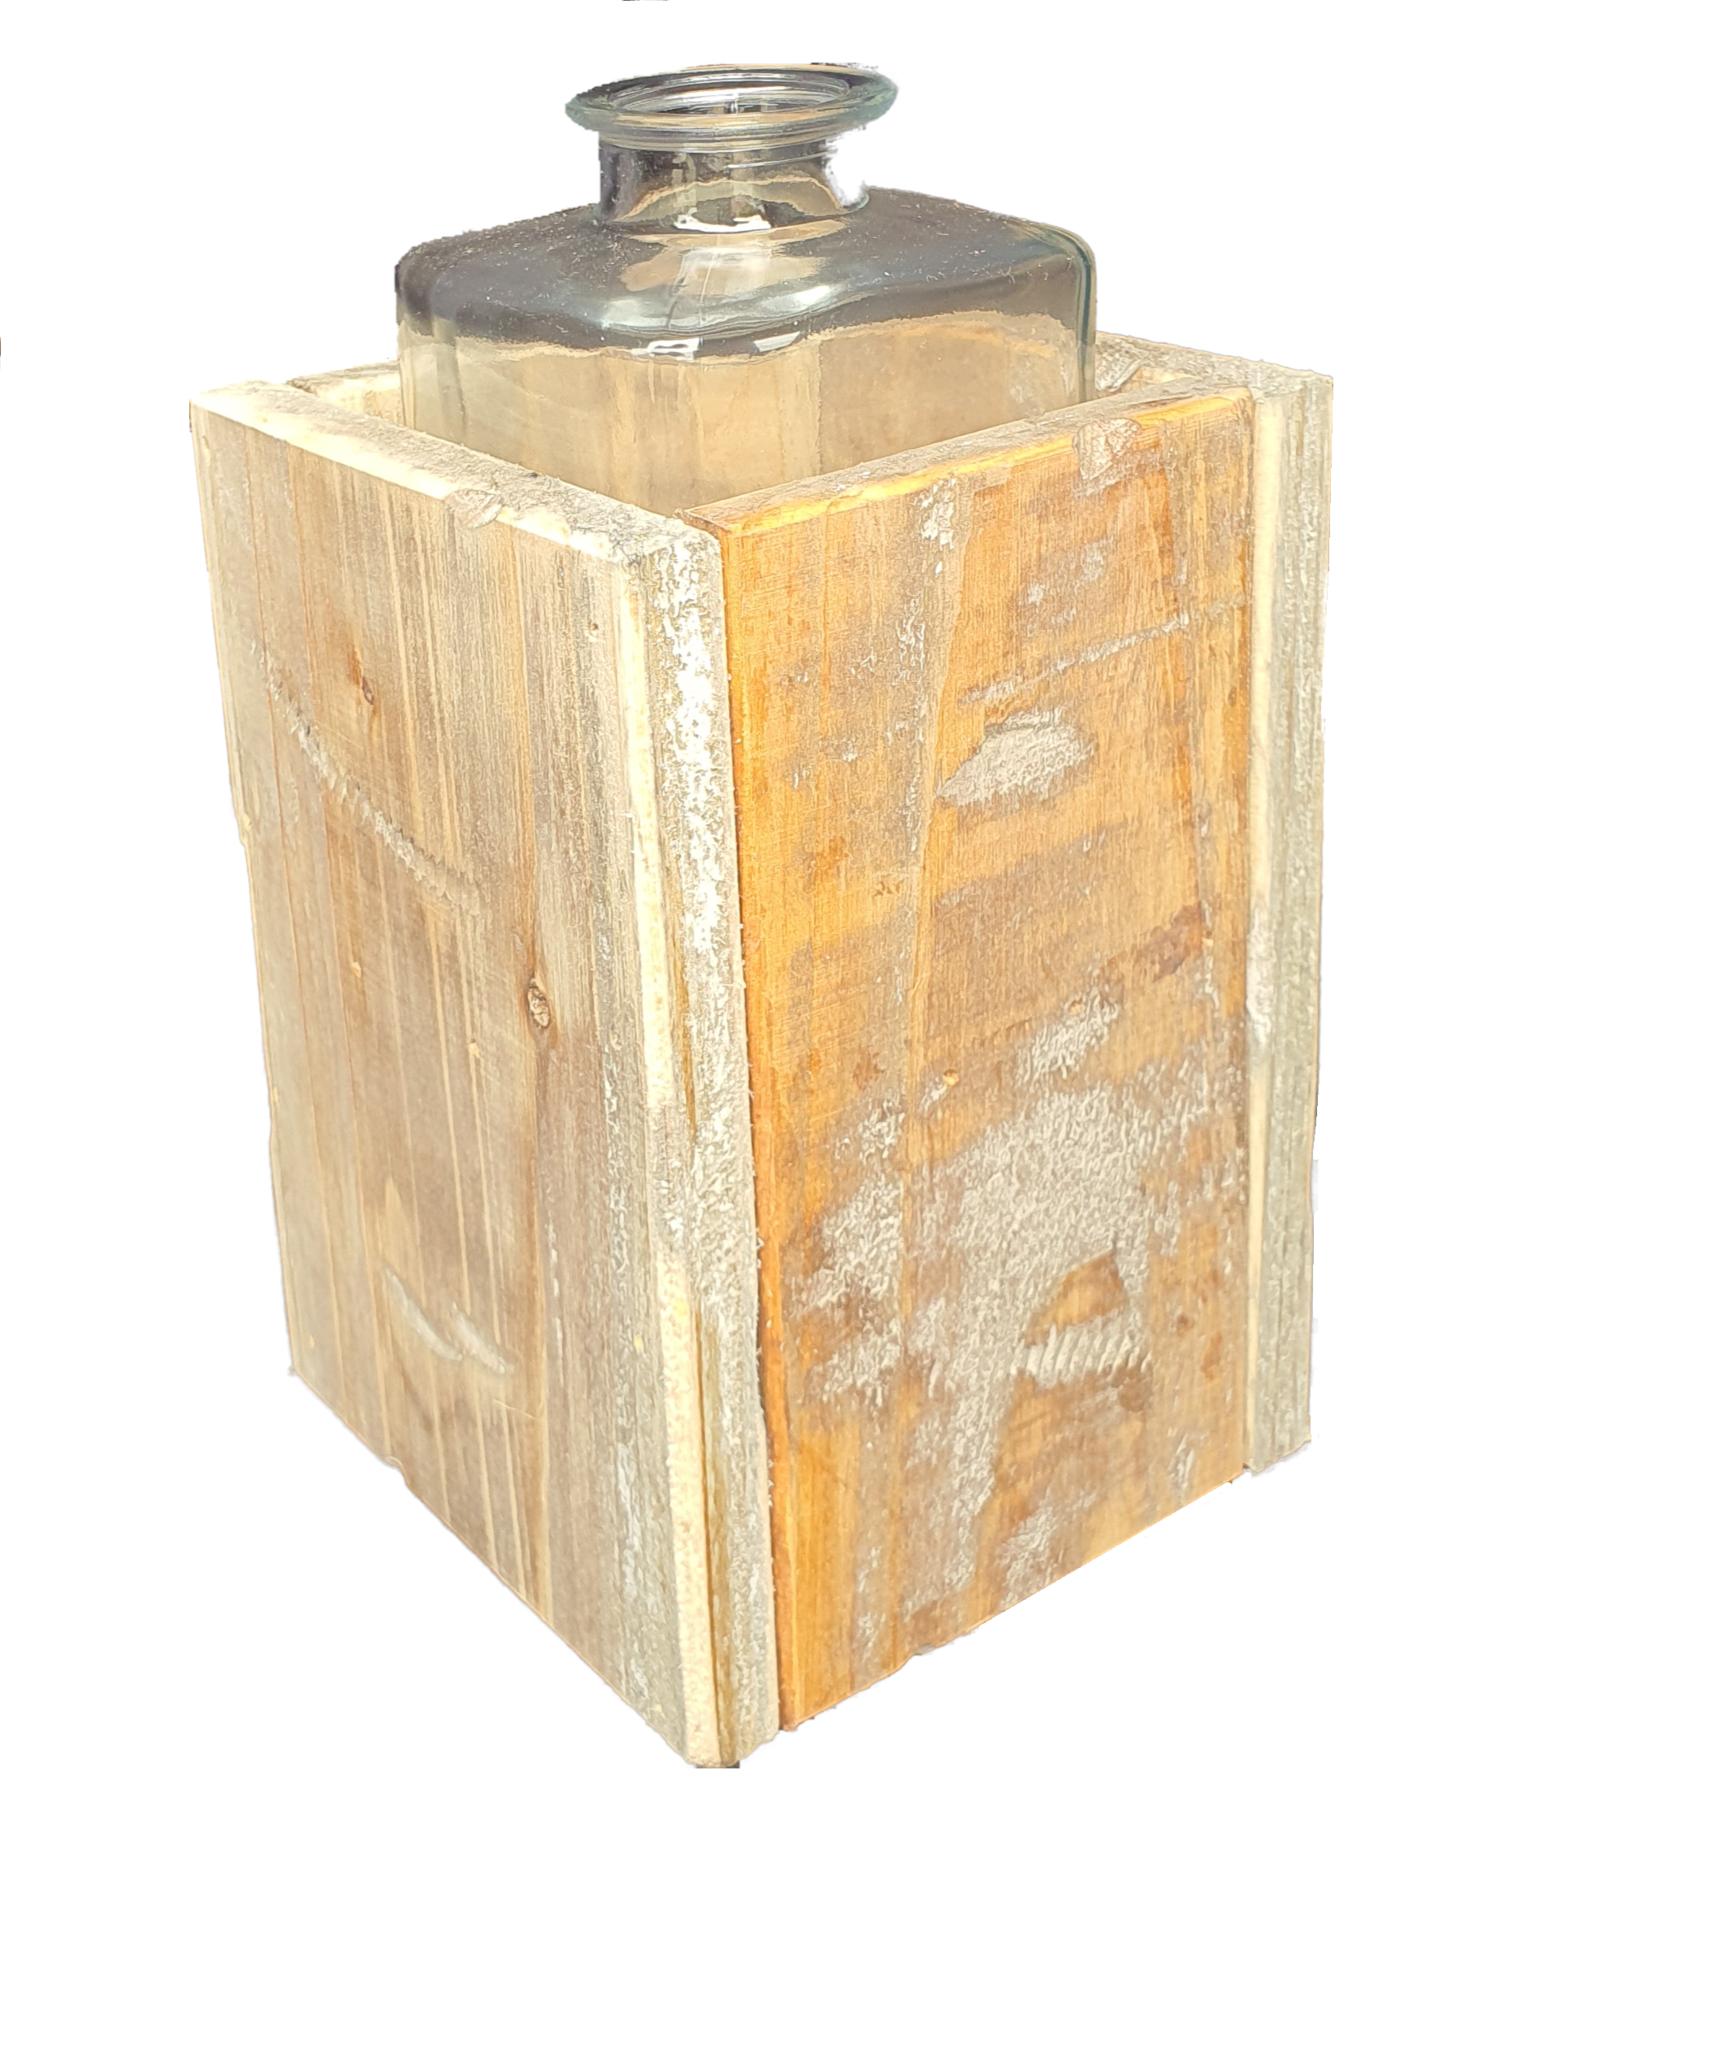 pot old dutchglass hold 2 sides 15-4